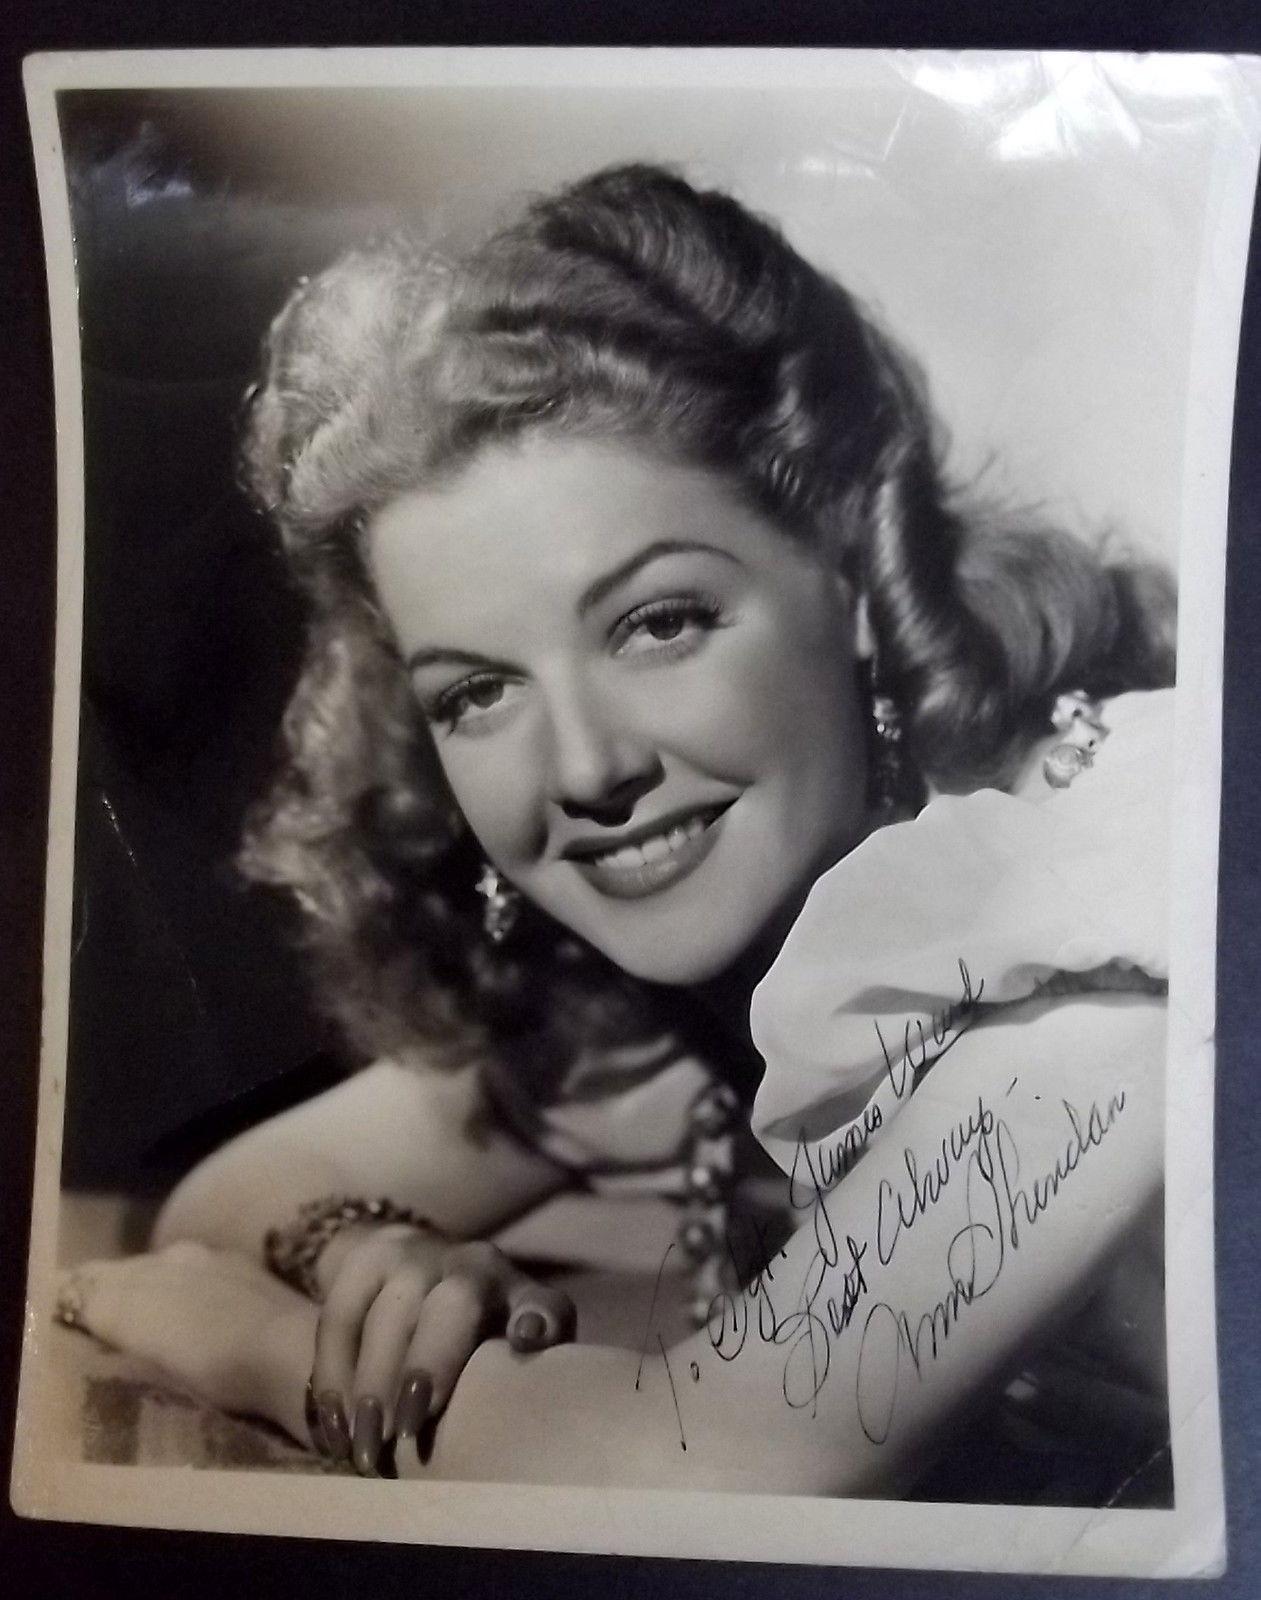 ANN SHERIDAN (ORIGINAL VINTAGE 1940,S AUTOGRAPH PHOTO) CLASSIC 40,S ACTRESS (WOW